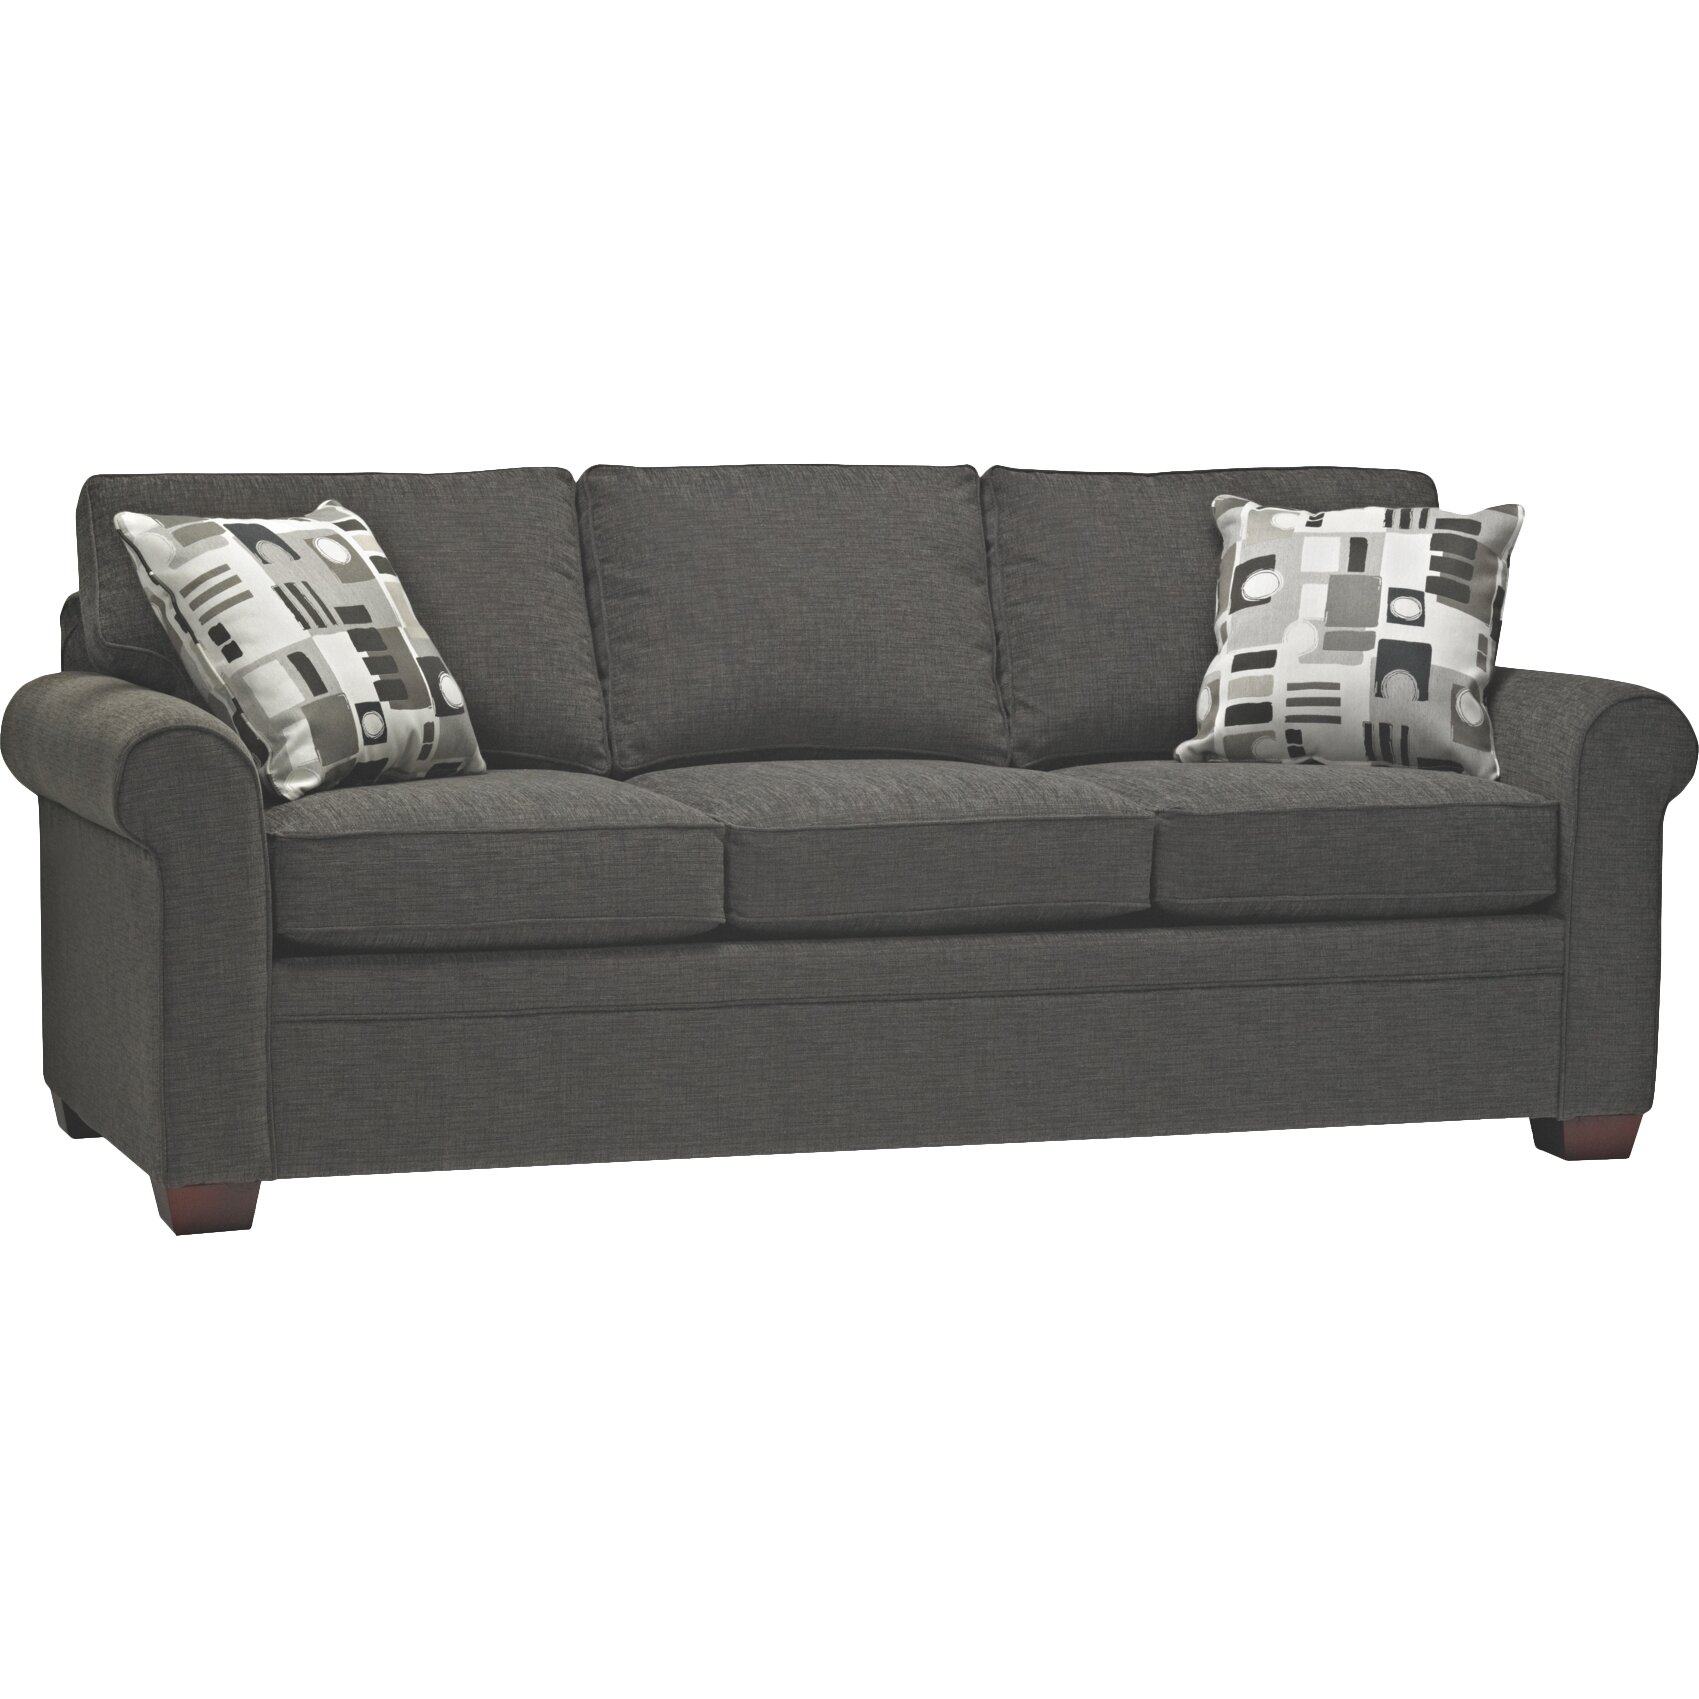 Tom Double Size Sofa Wayfair